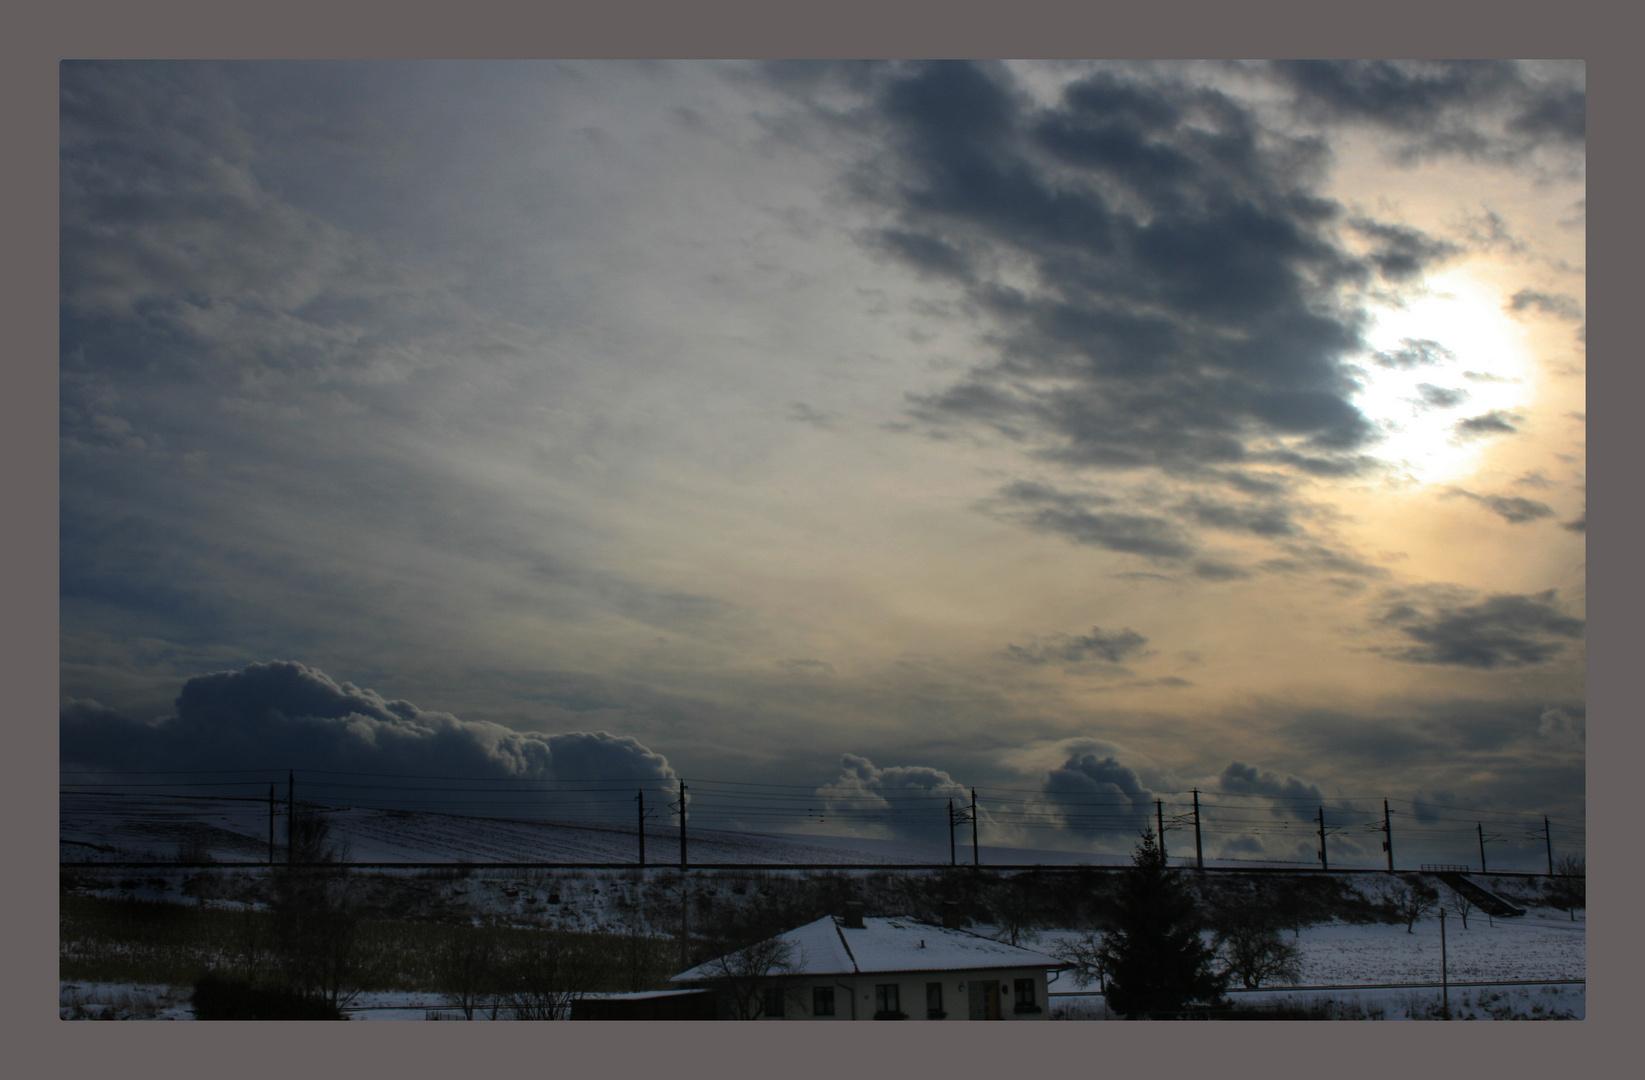 Ein wolkiger Tag...